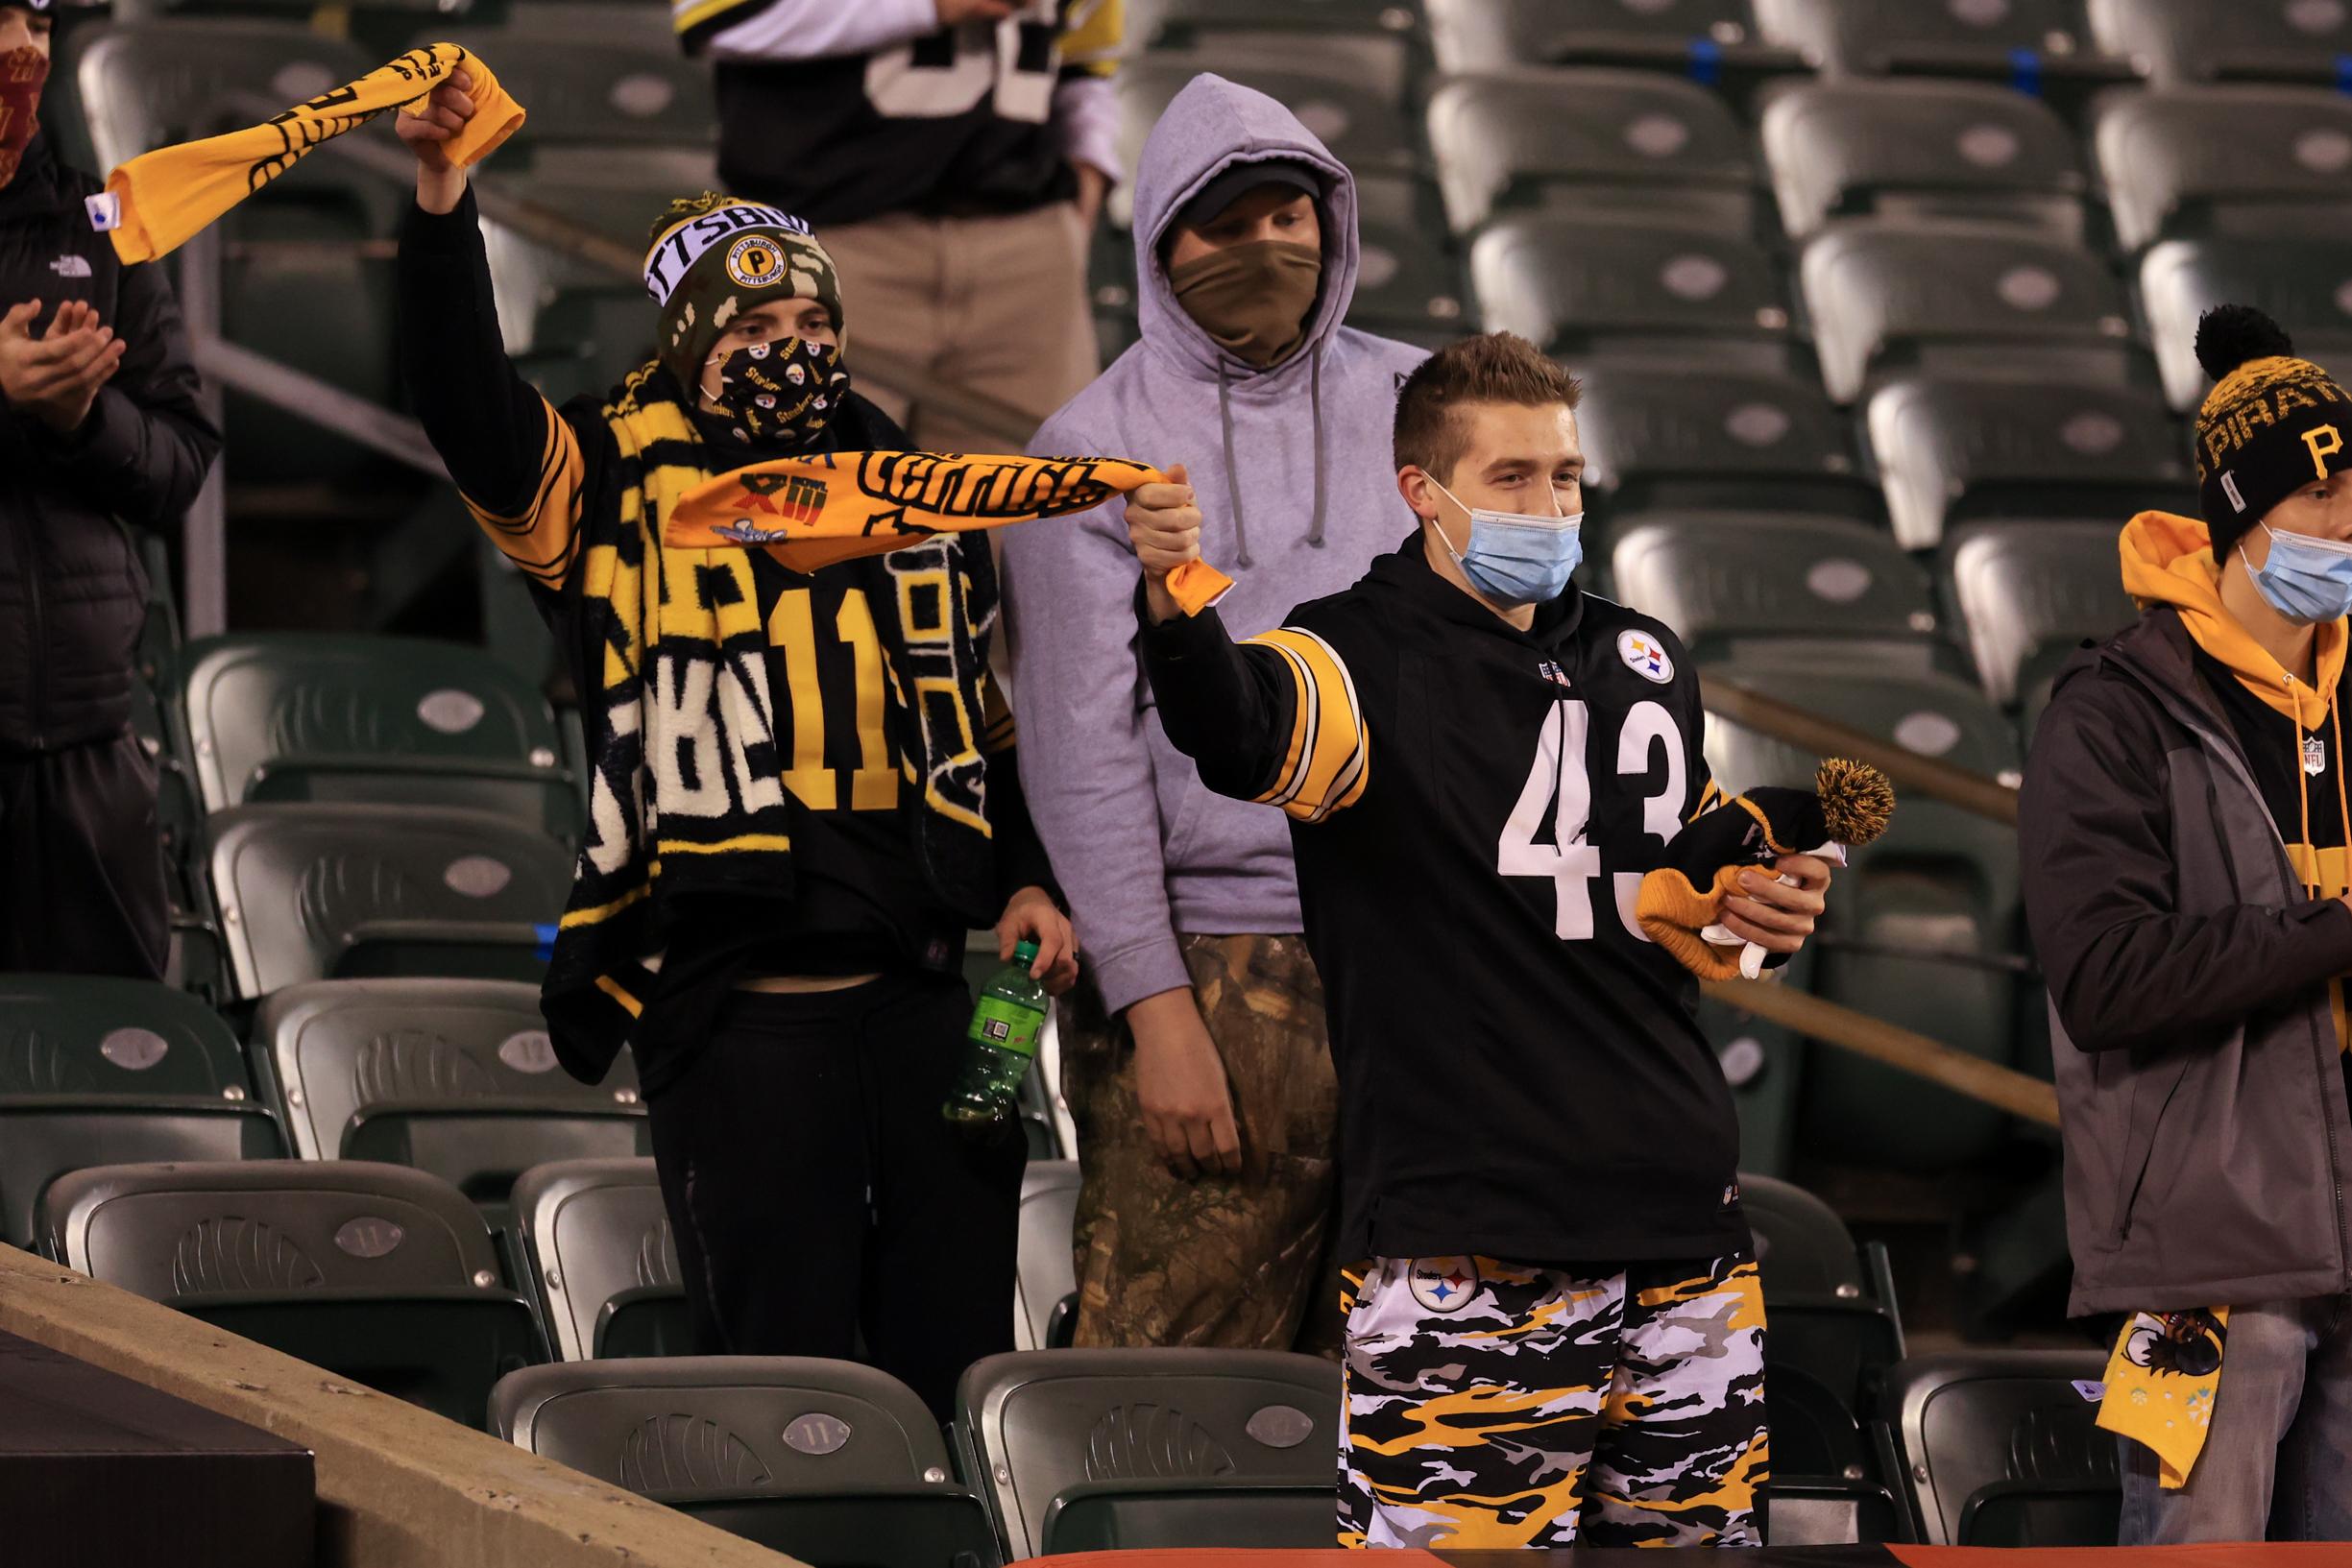 NFL: DEC 21 Steelers at Bengals